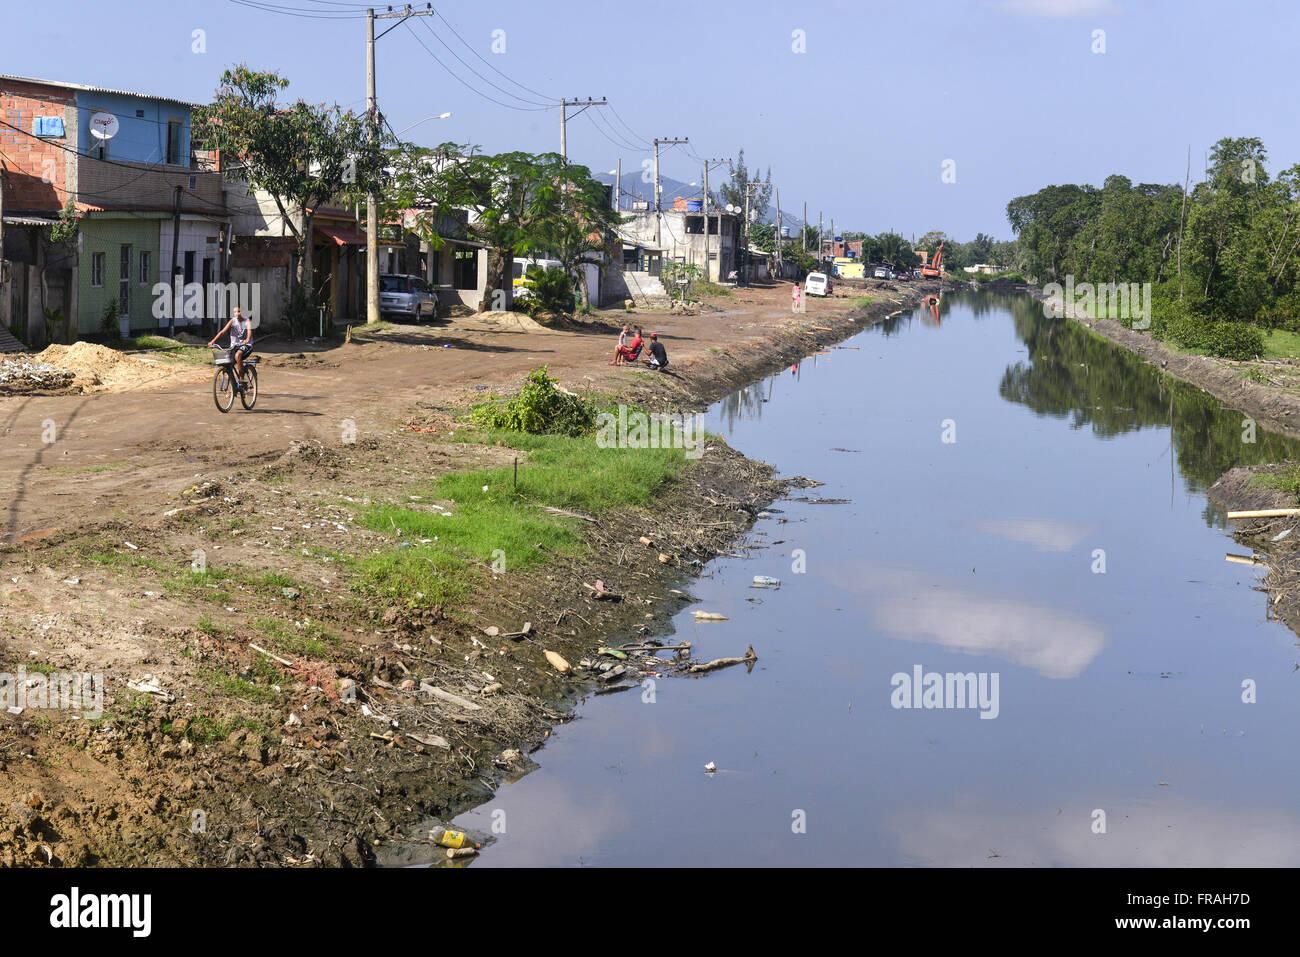 Canal in a residential area in Piraquê community - neighborhood Guaratiba - Stock Image